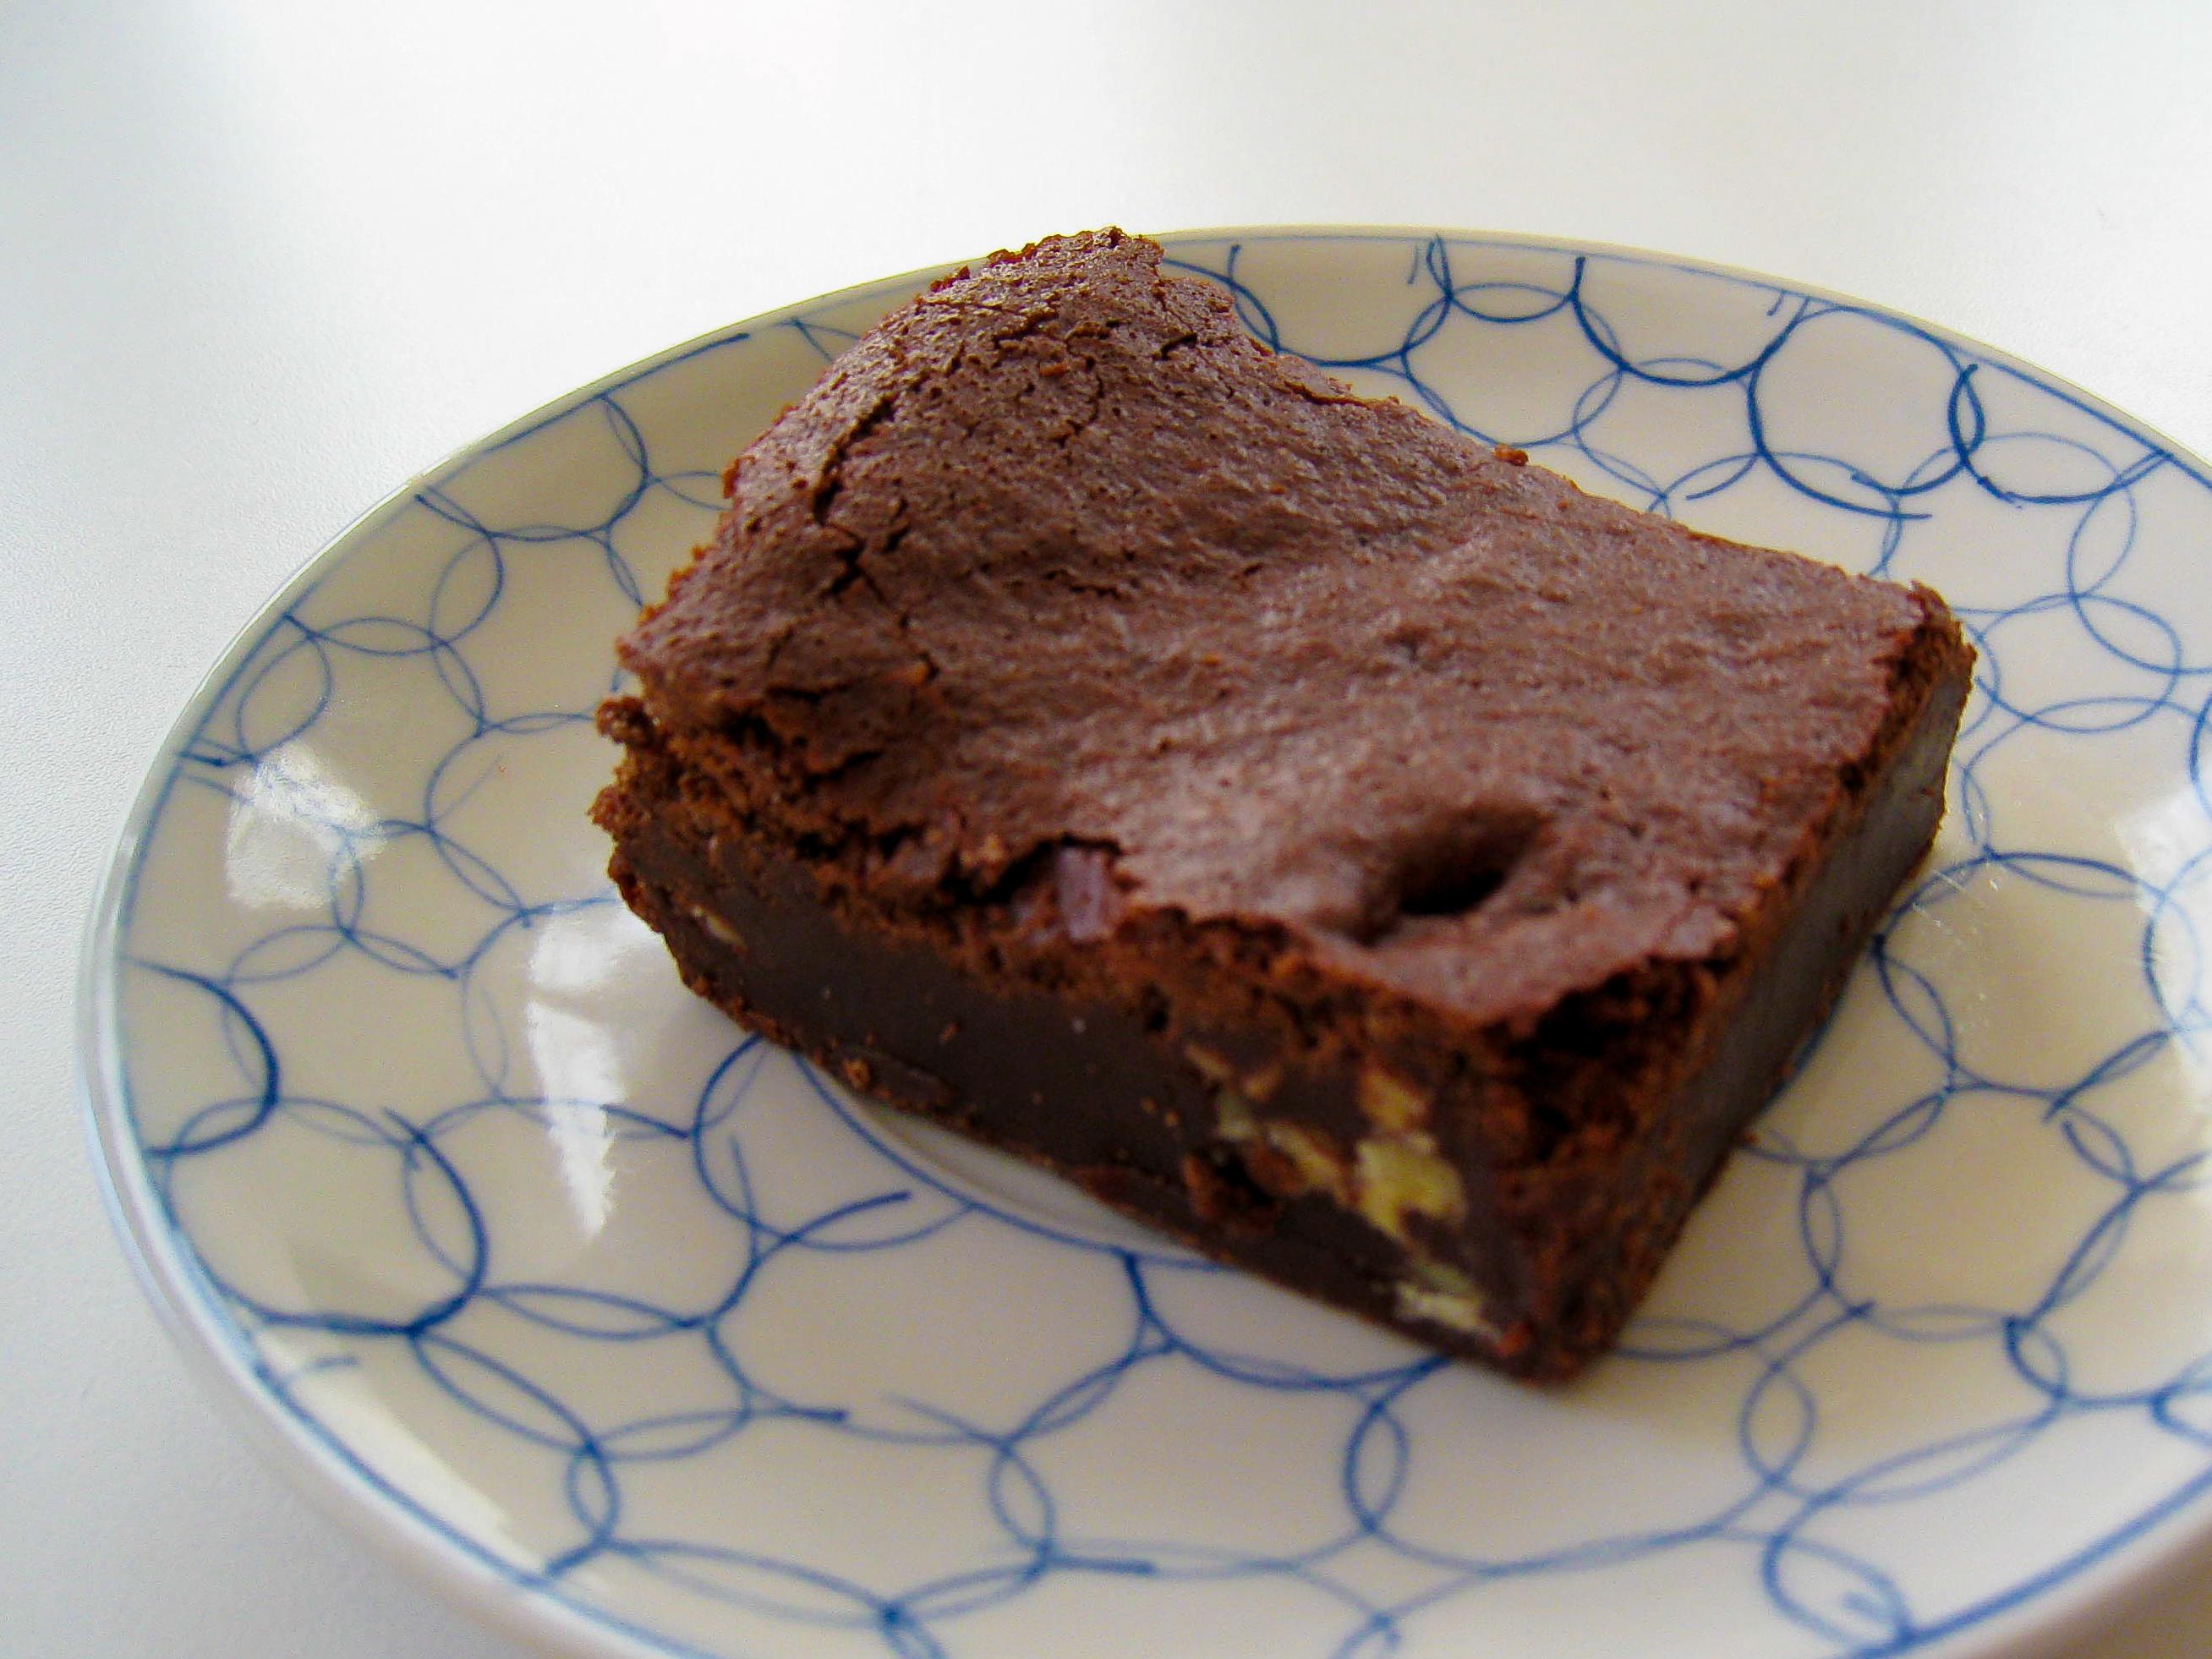 File:Vegan Chocolate Dream Brownies.jpg - Wikipedia, the free ...